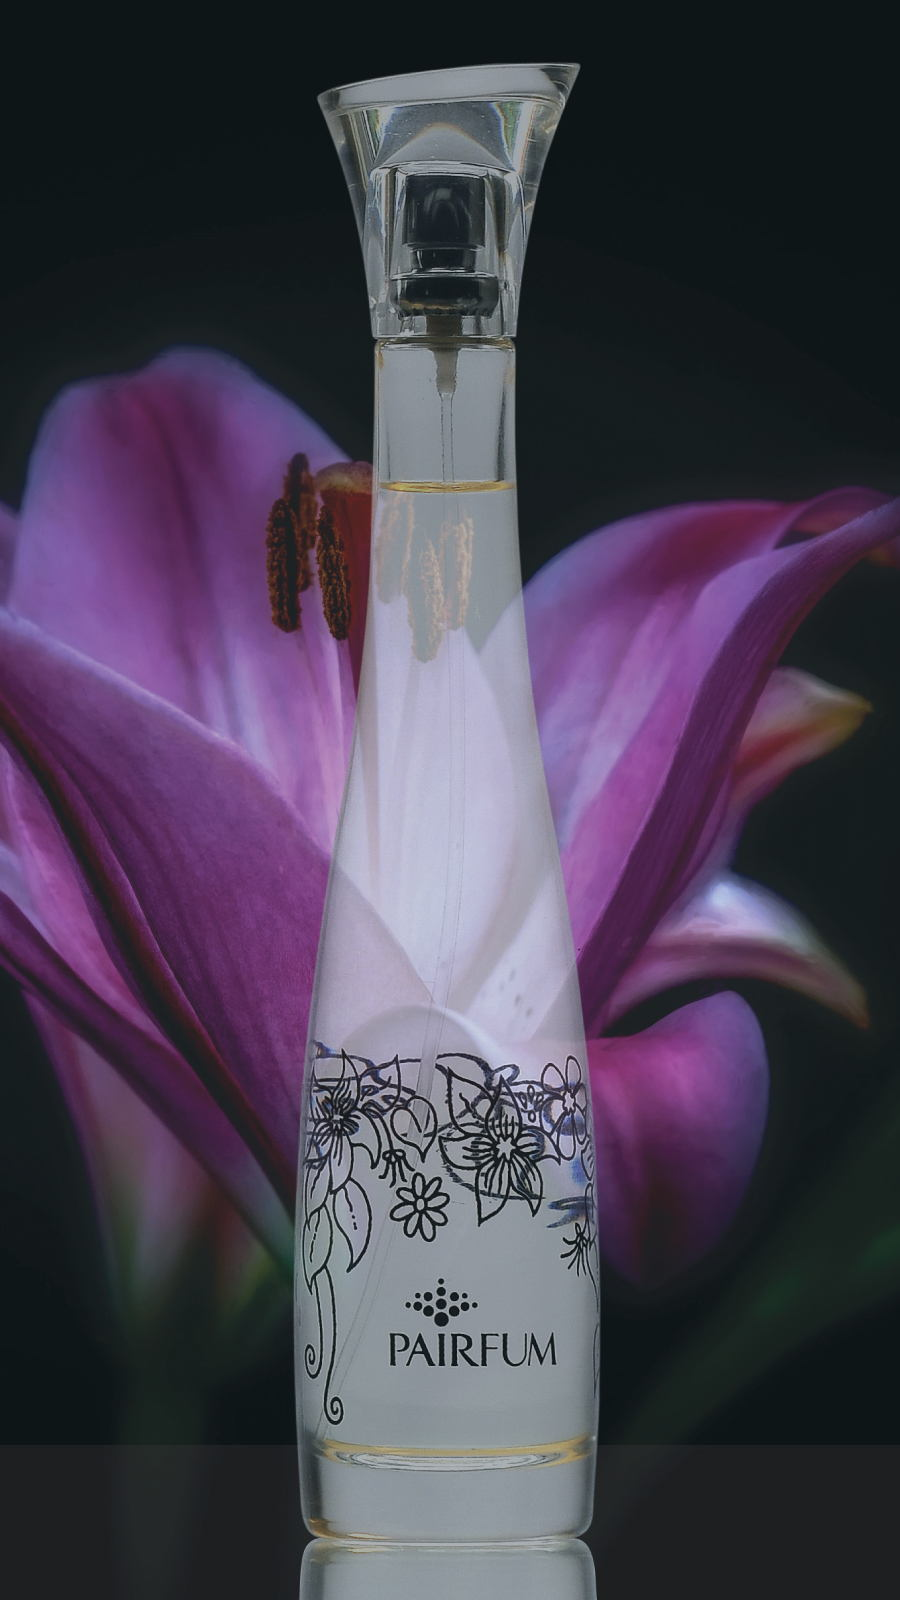 Flacon Room Fragrance Spray Black Orchid Flower 9 16